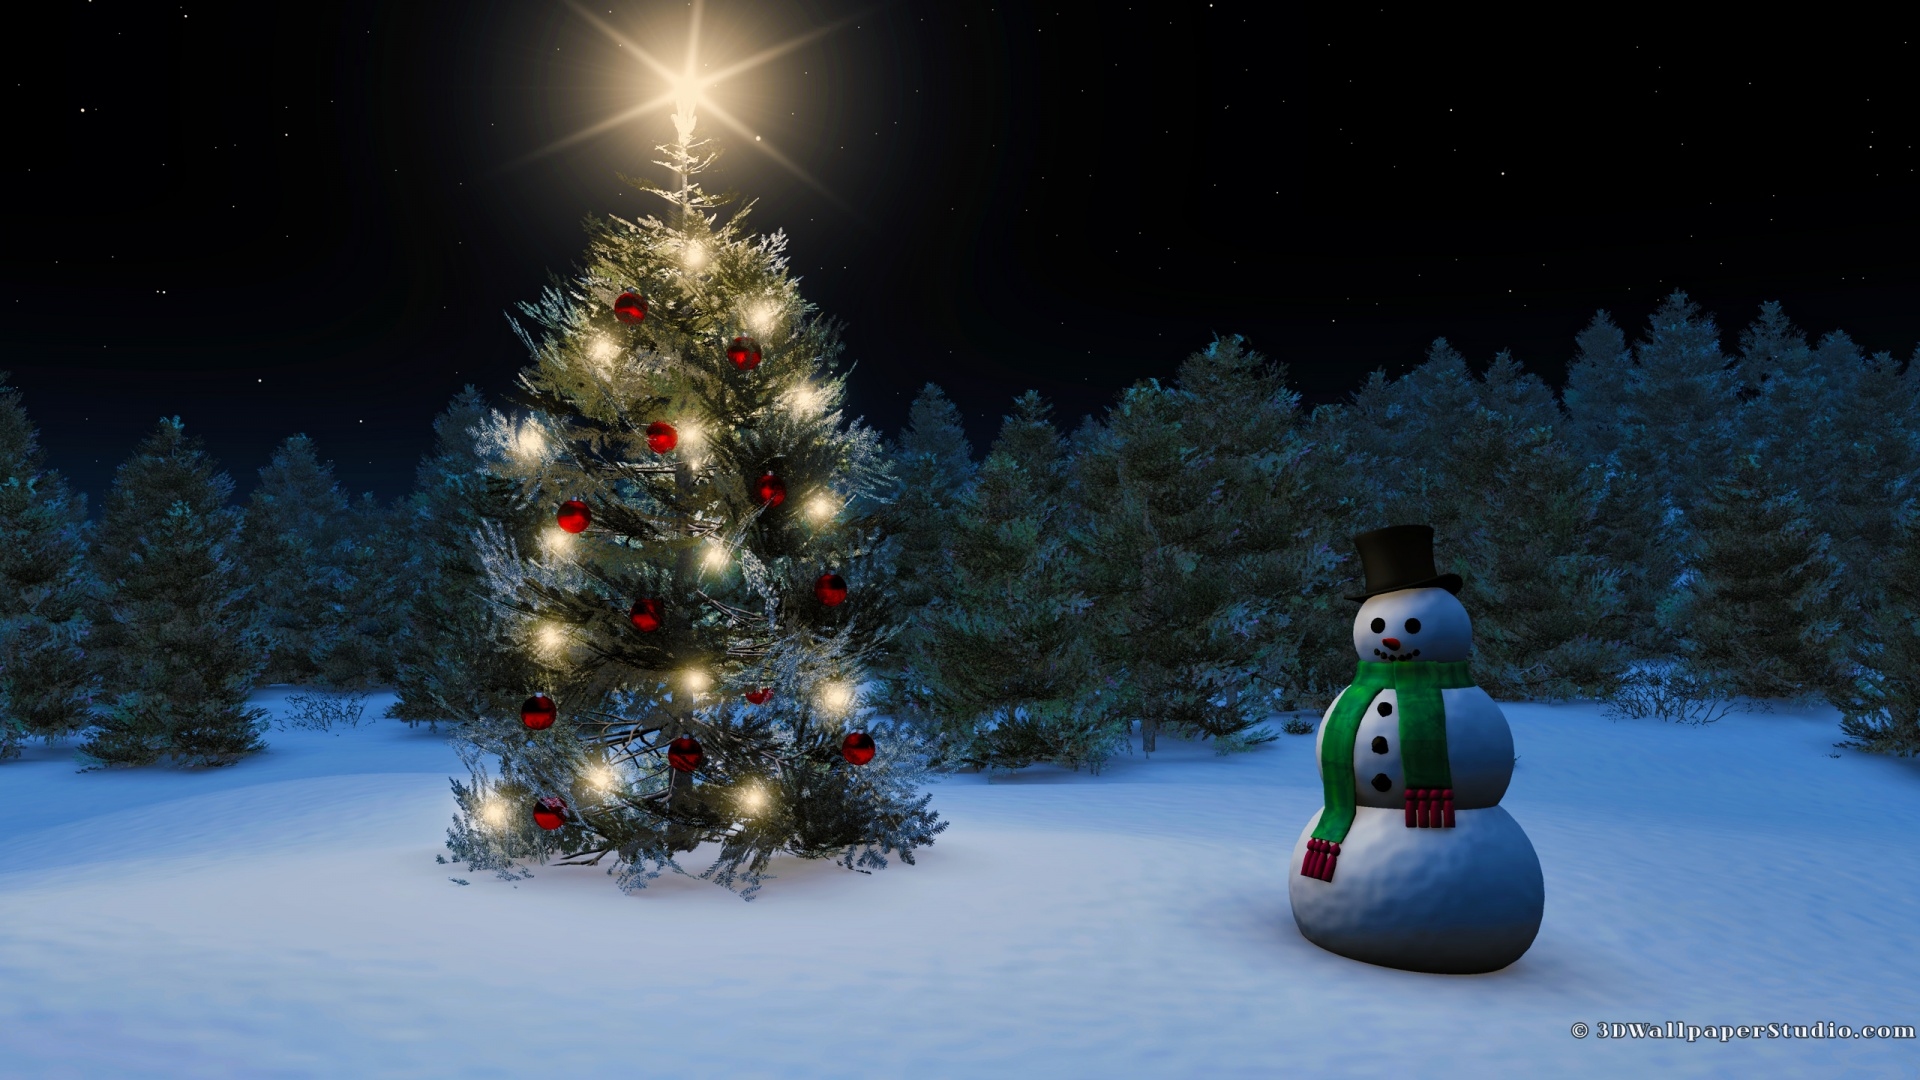 Christmas Wallpaper 1920X1080 153624 1920x1080